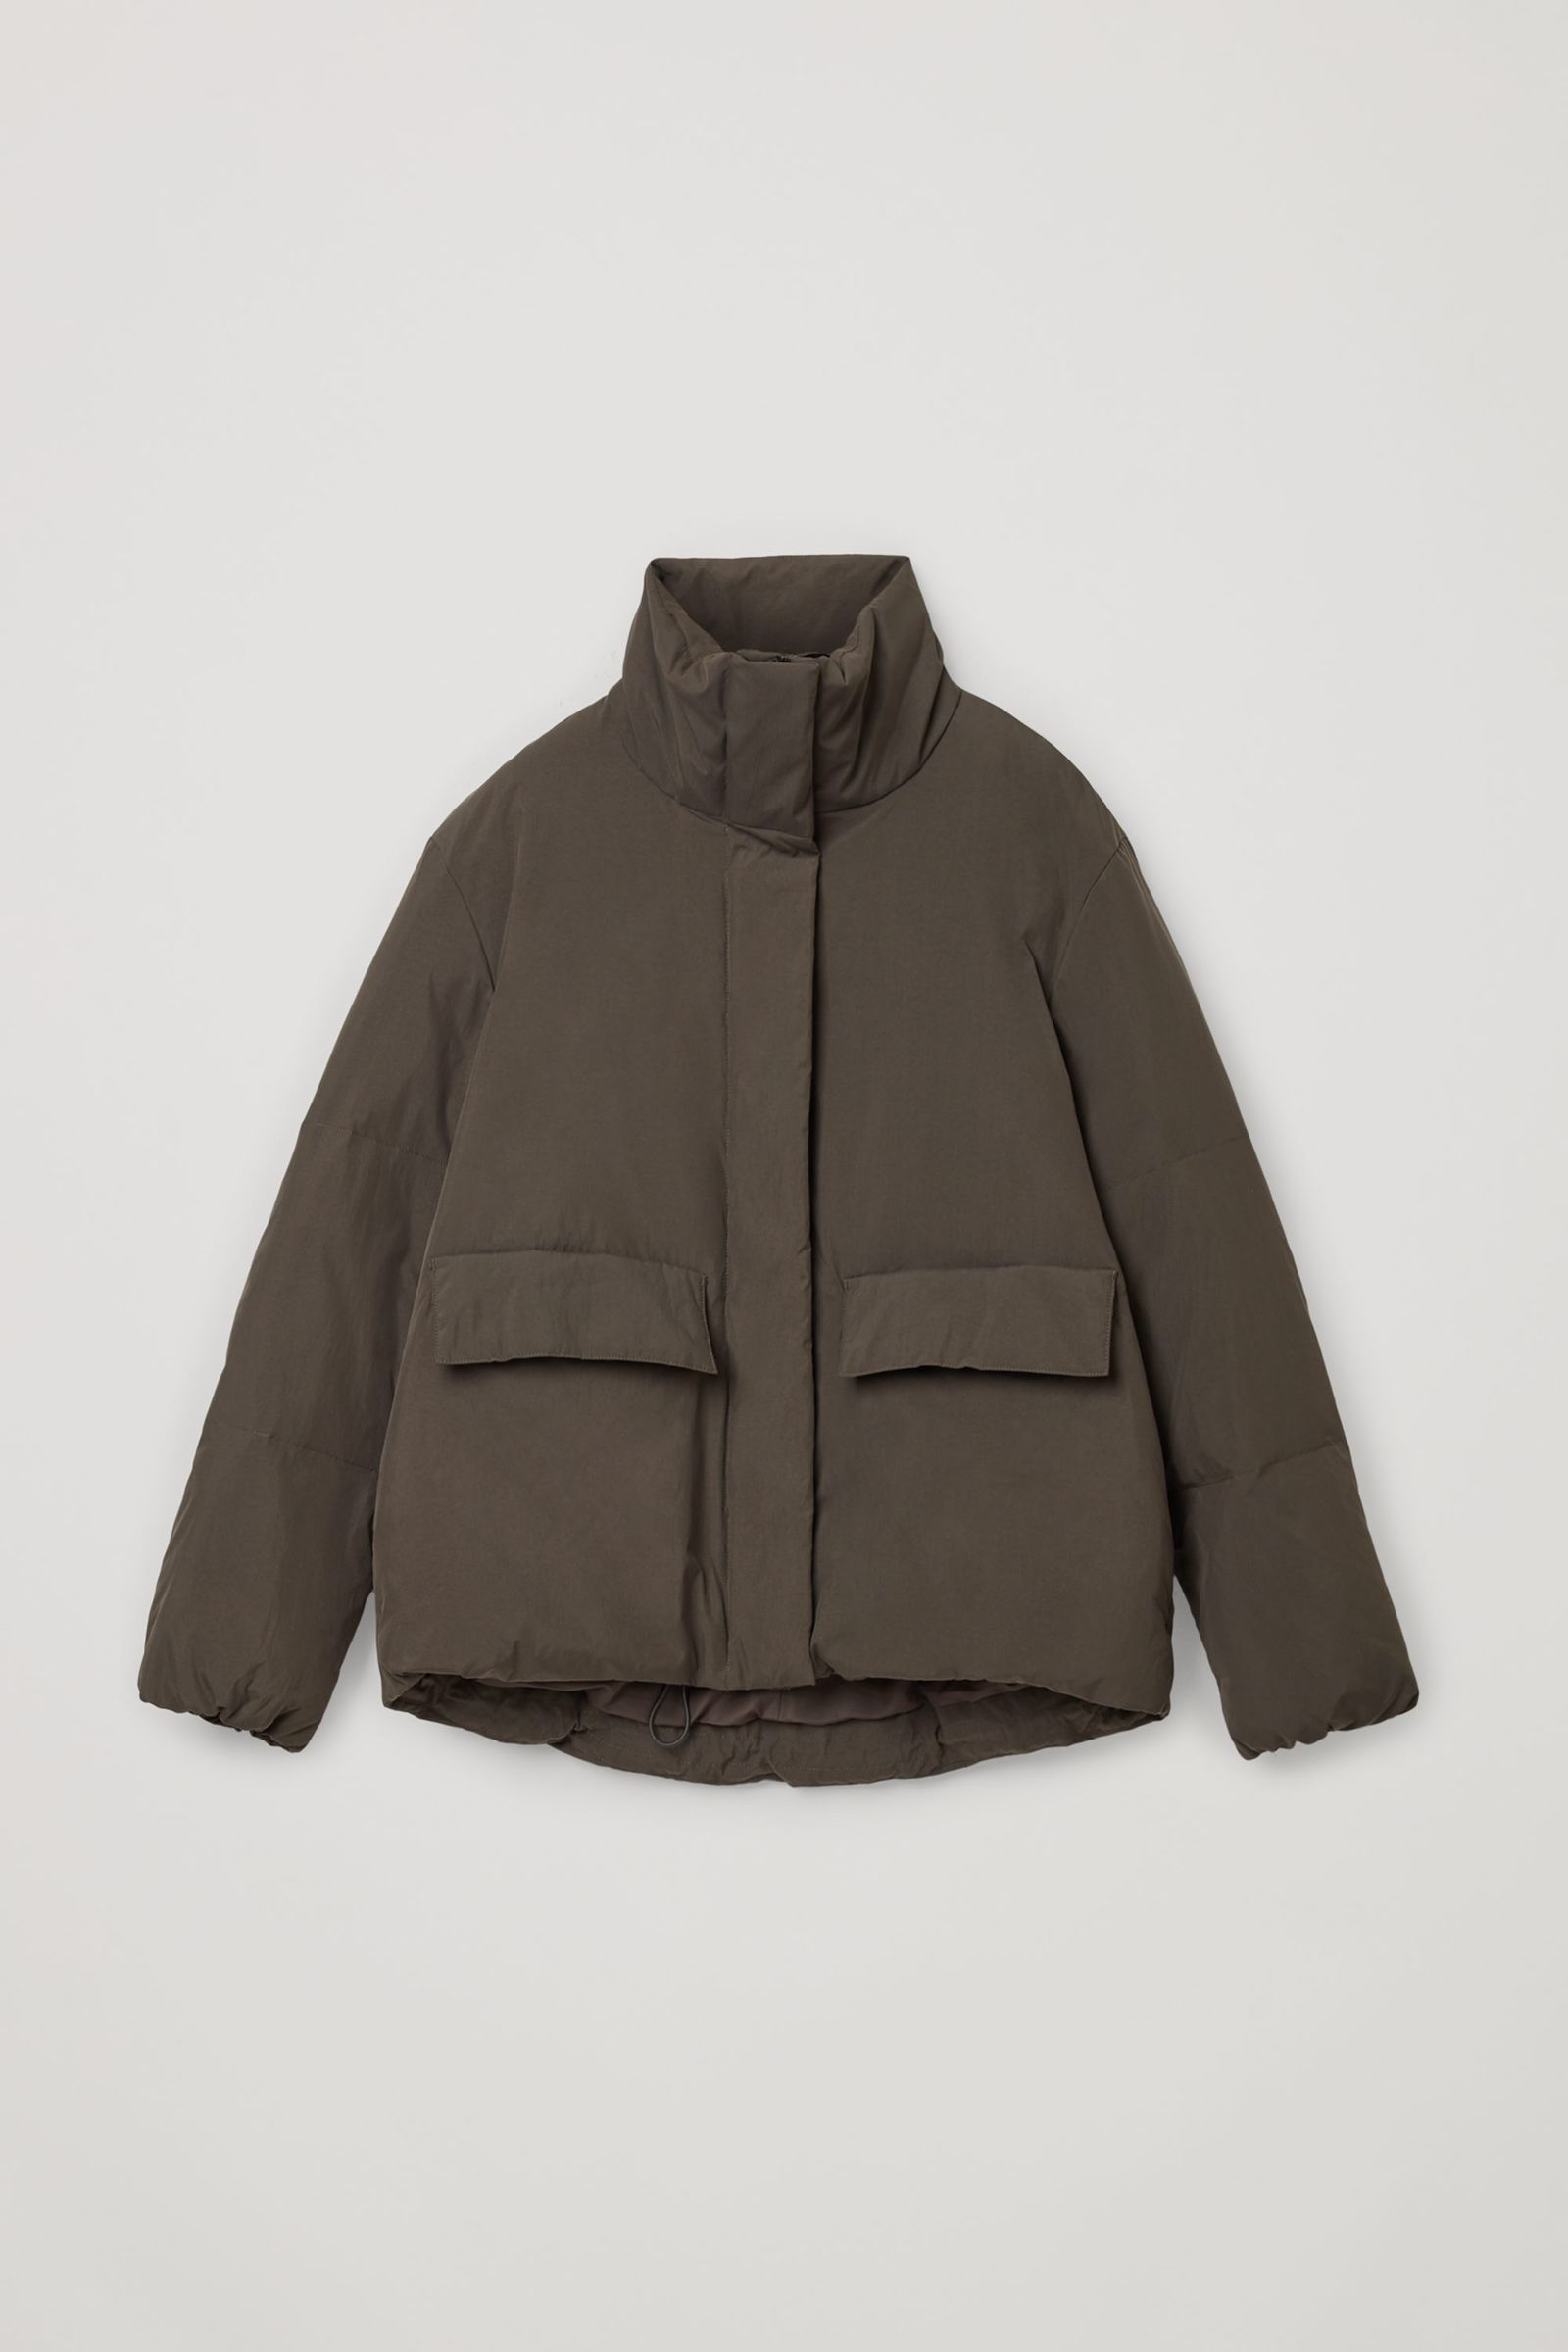 COS 패딩 푸퍼 재킷의 다크 브라운컬러 Product입니다.